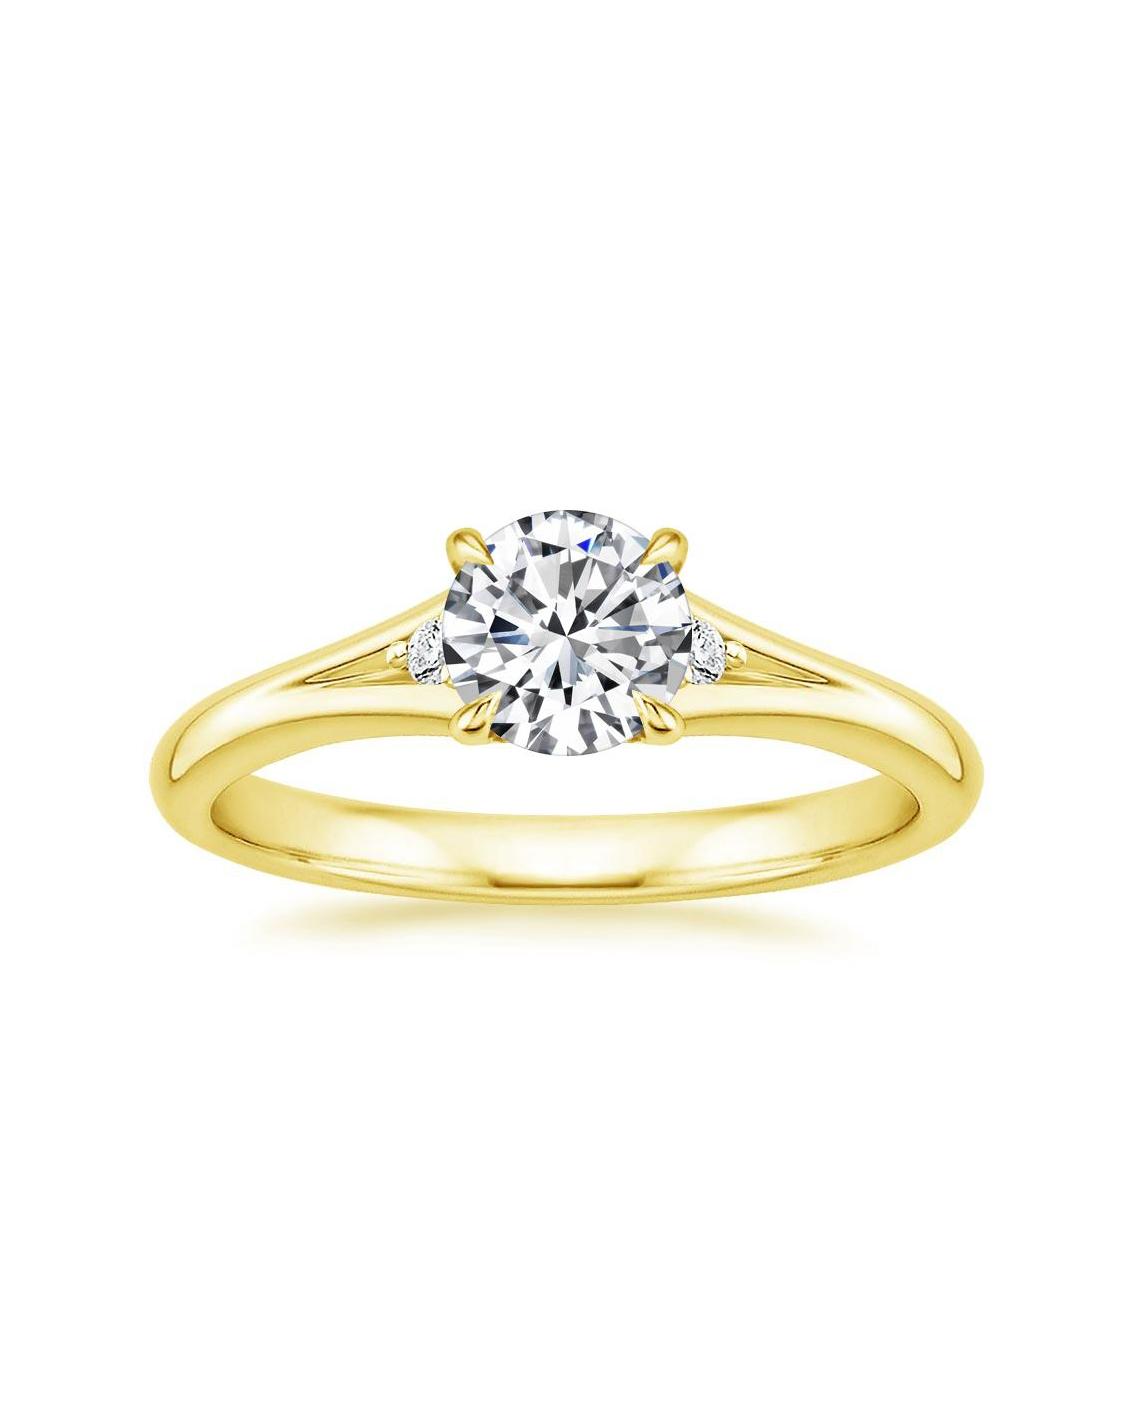 18K Yellow Gold Lena Diamond Ring